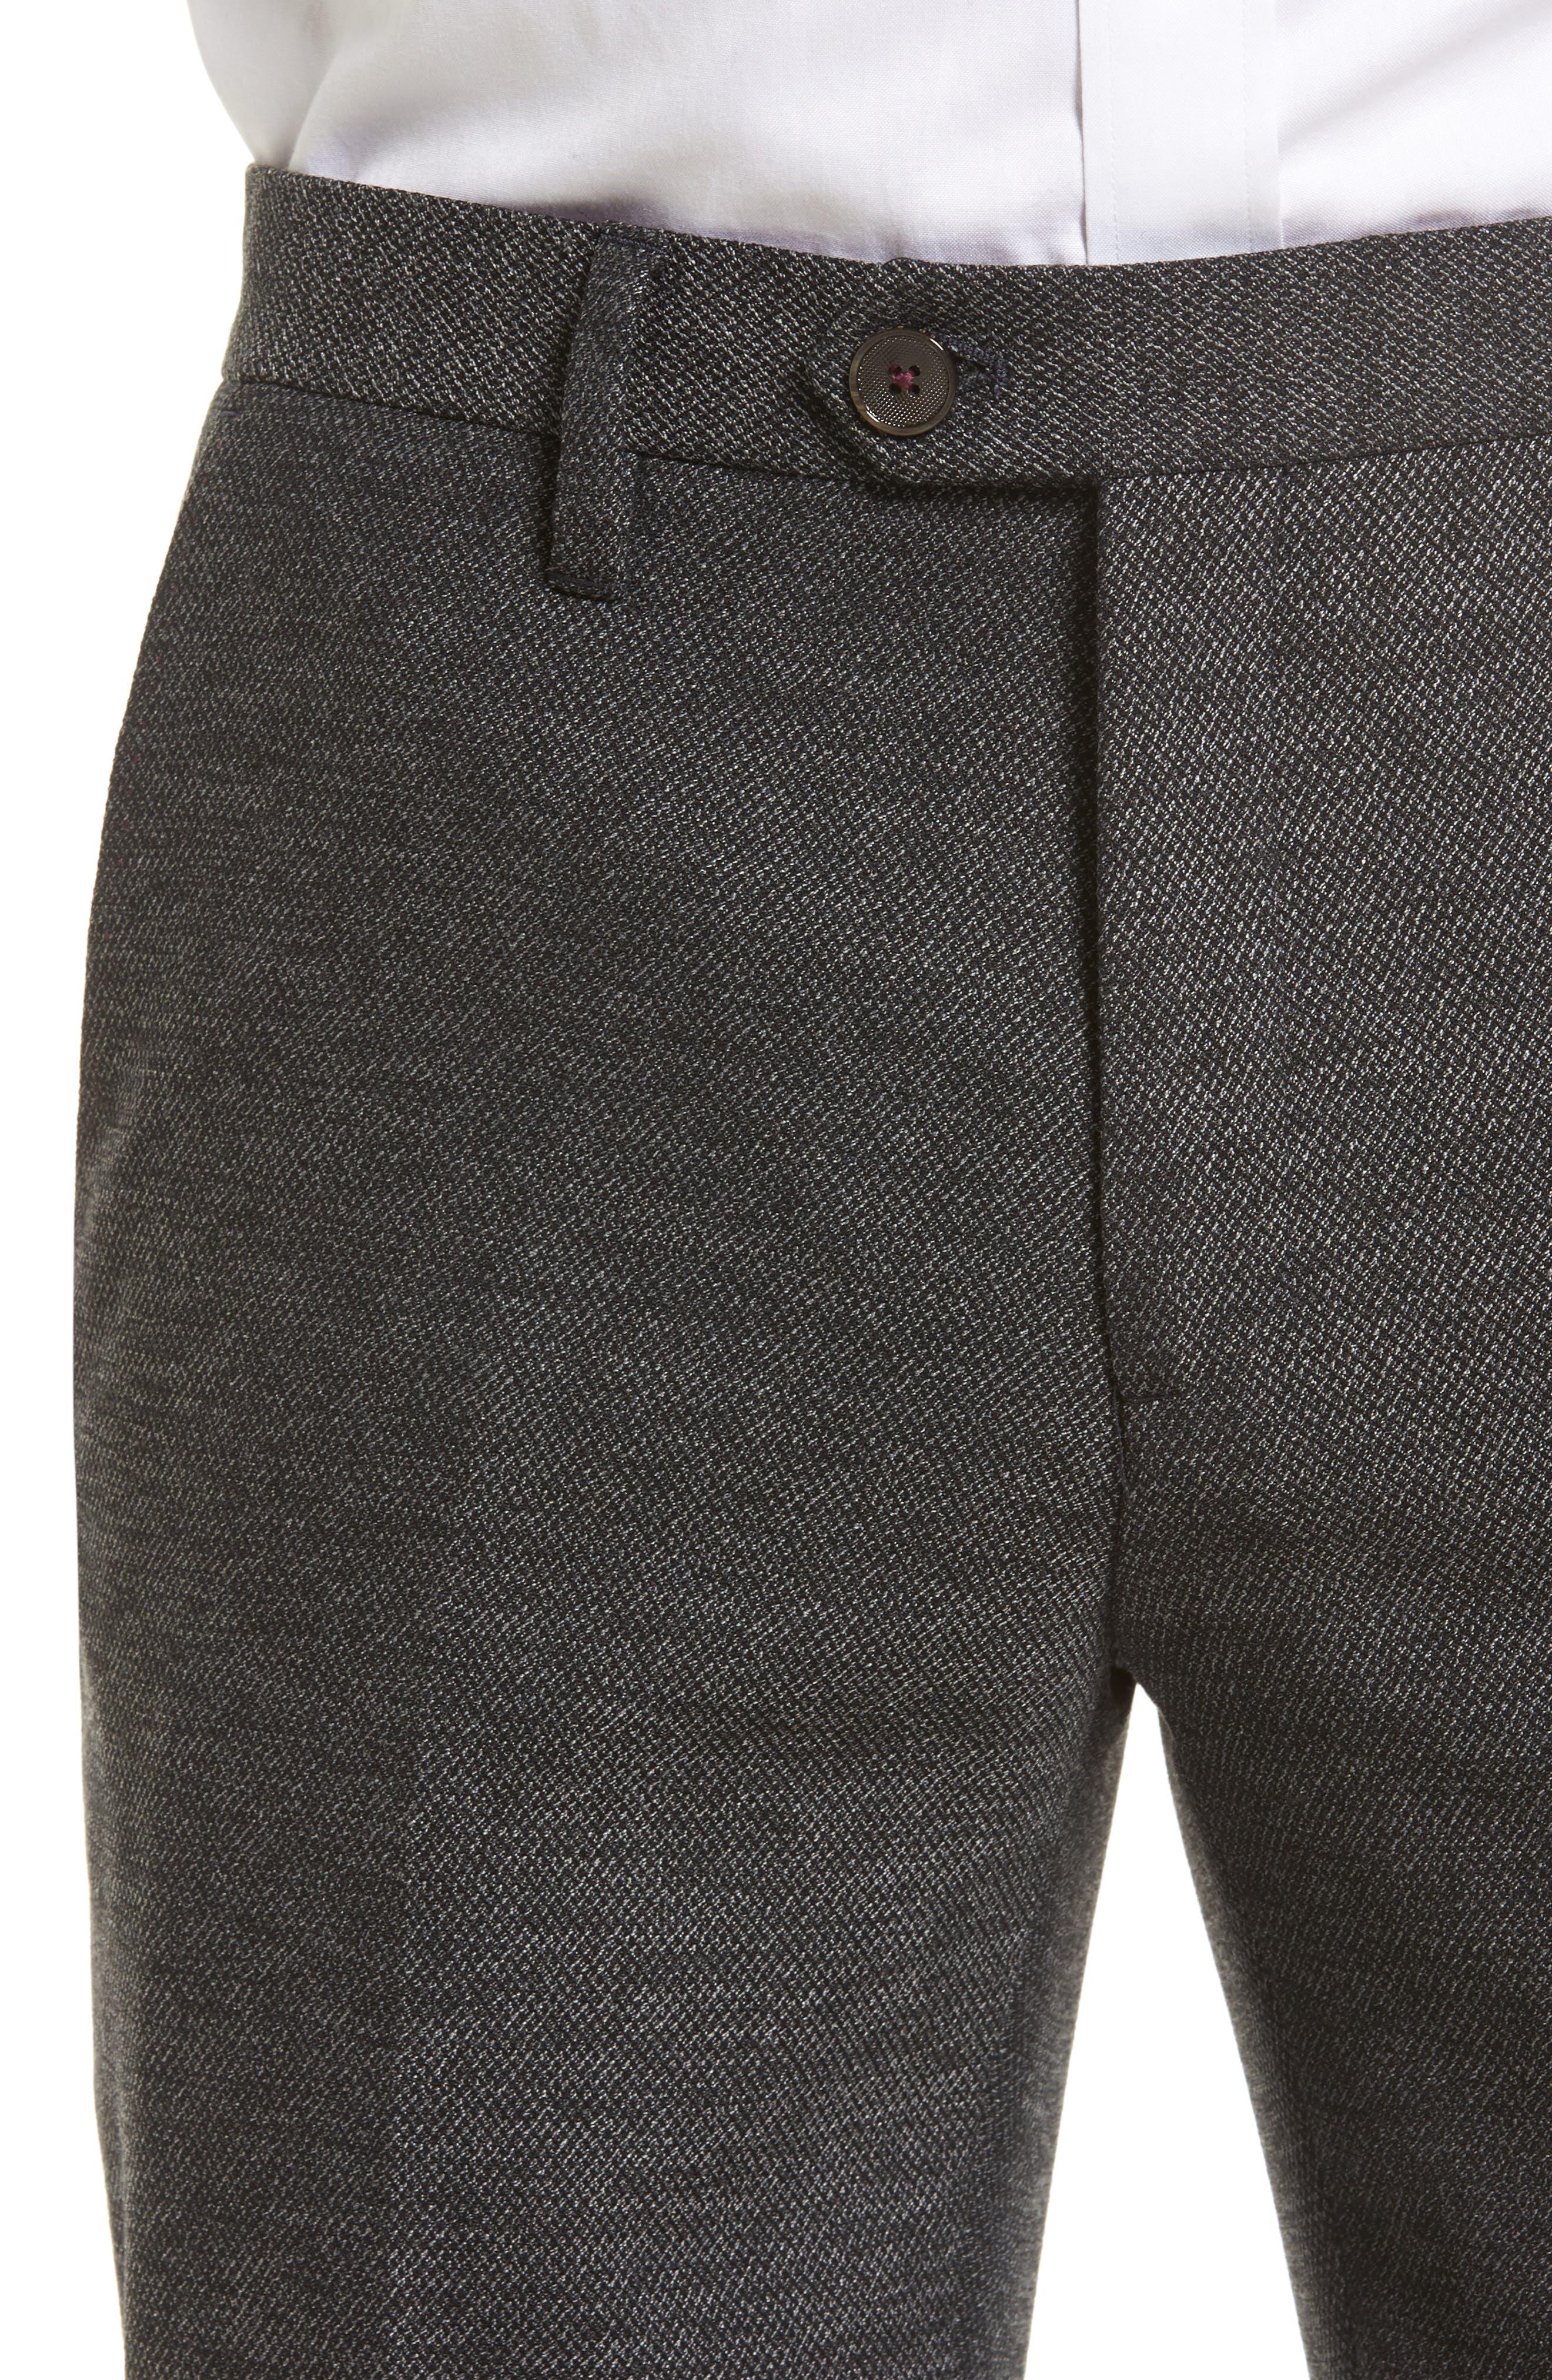 Porttro Modern Slim Fit Trousers,                             Alternate thumbnail 5, color,                             010